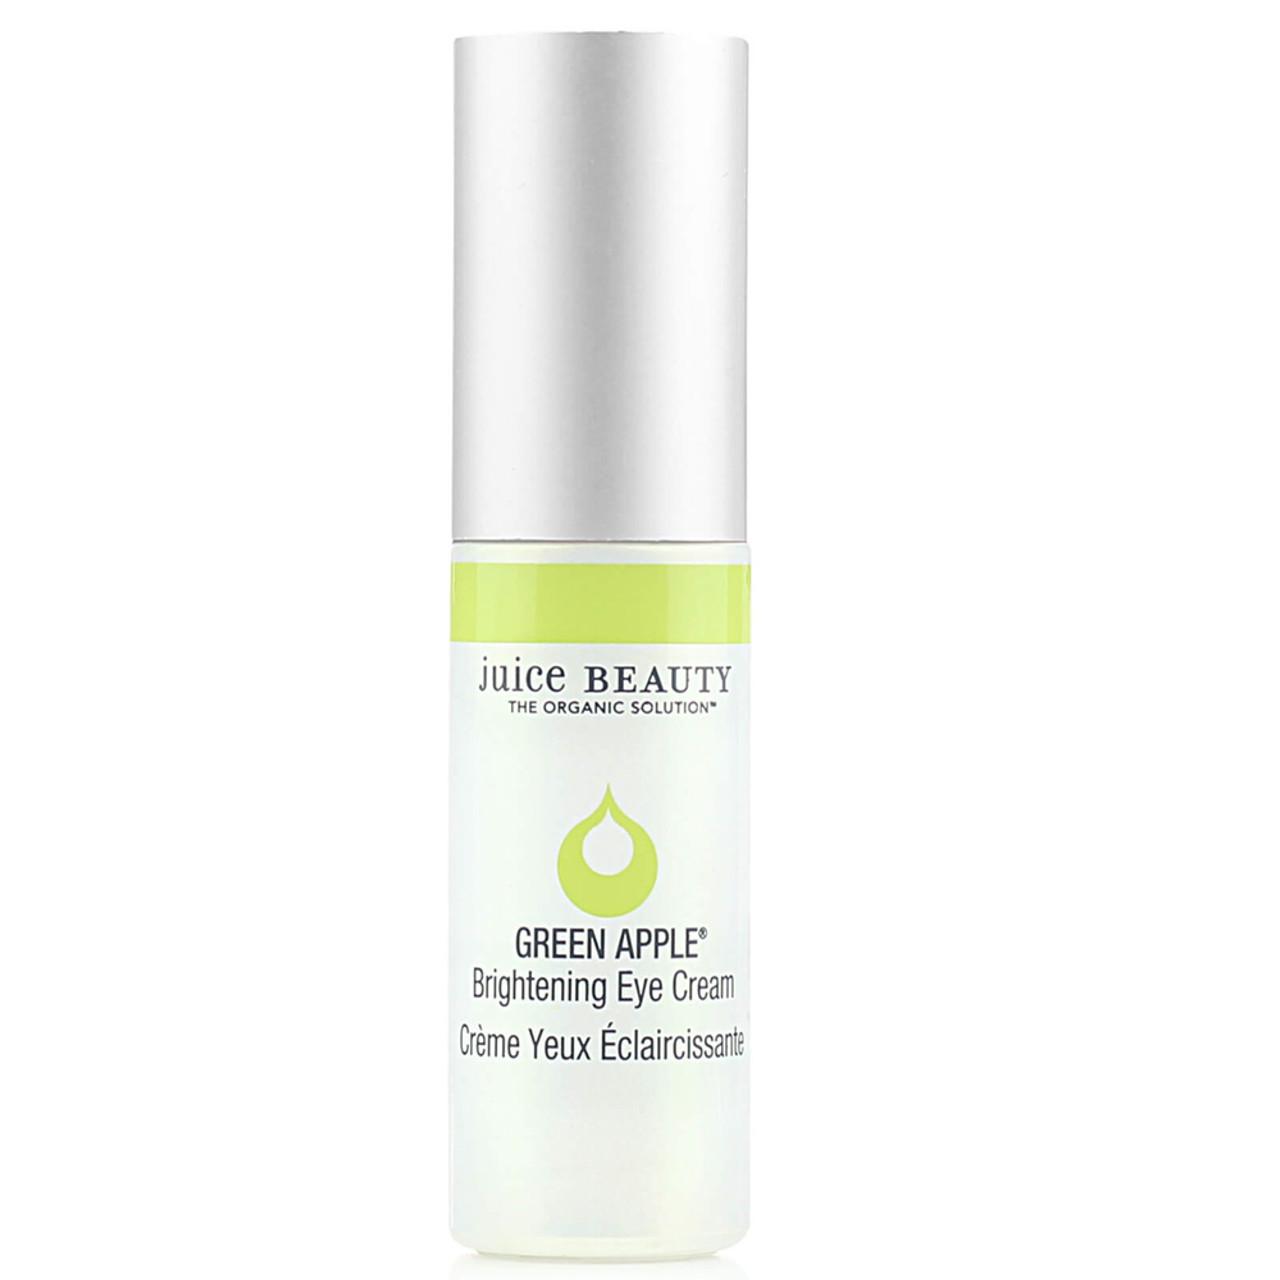 Juice Beauty Green Apple Brightening Eye Cream